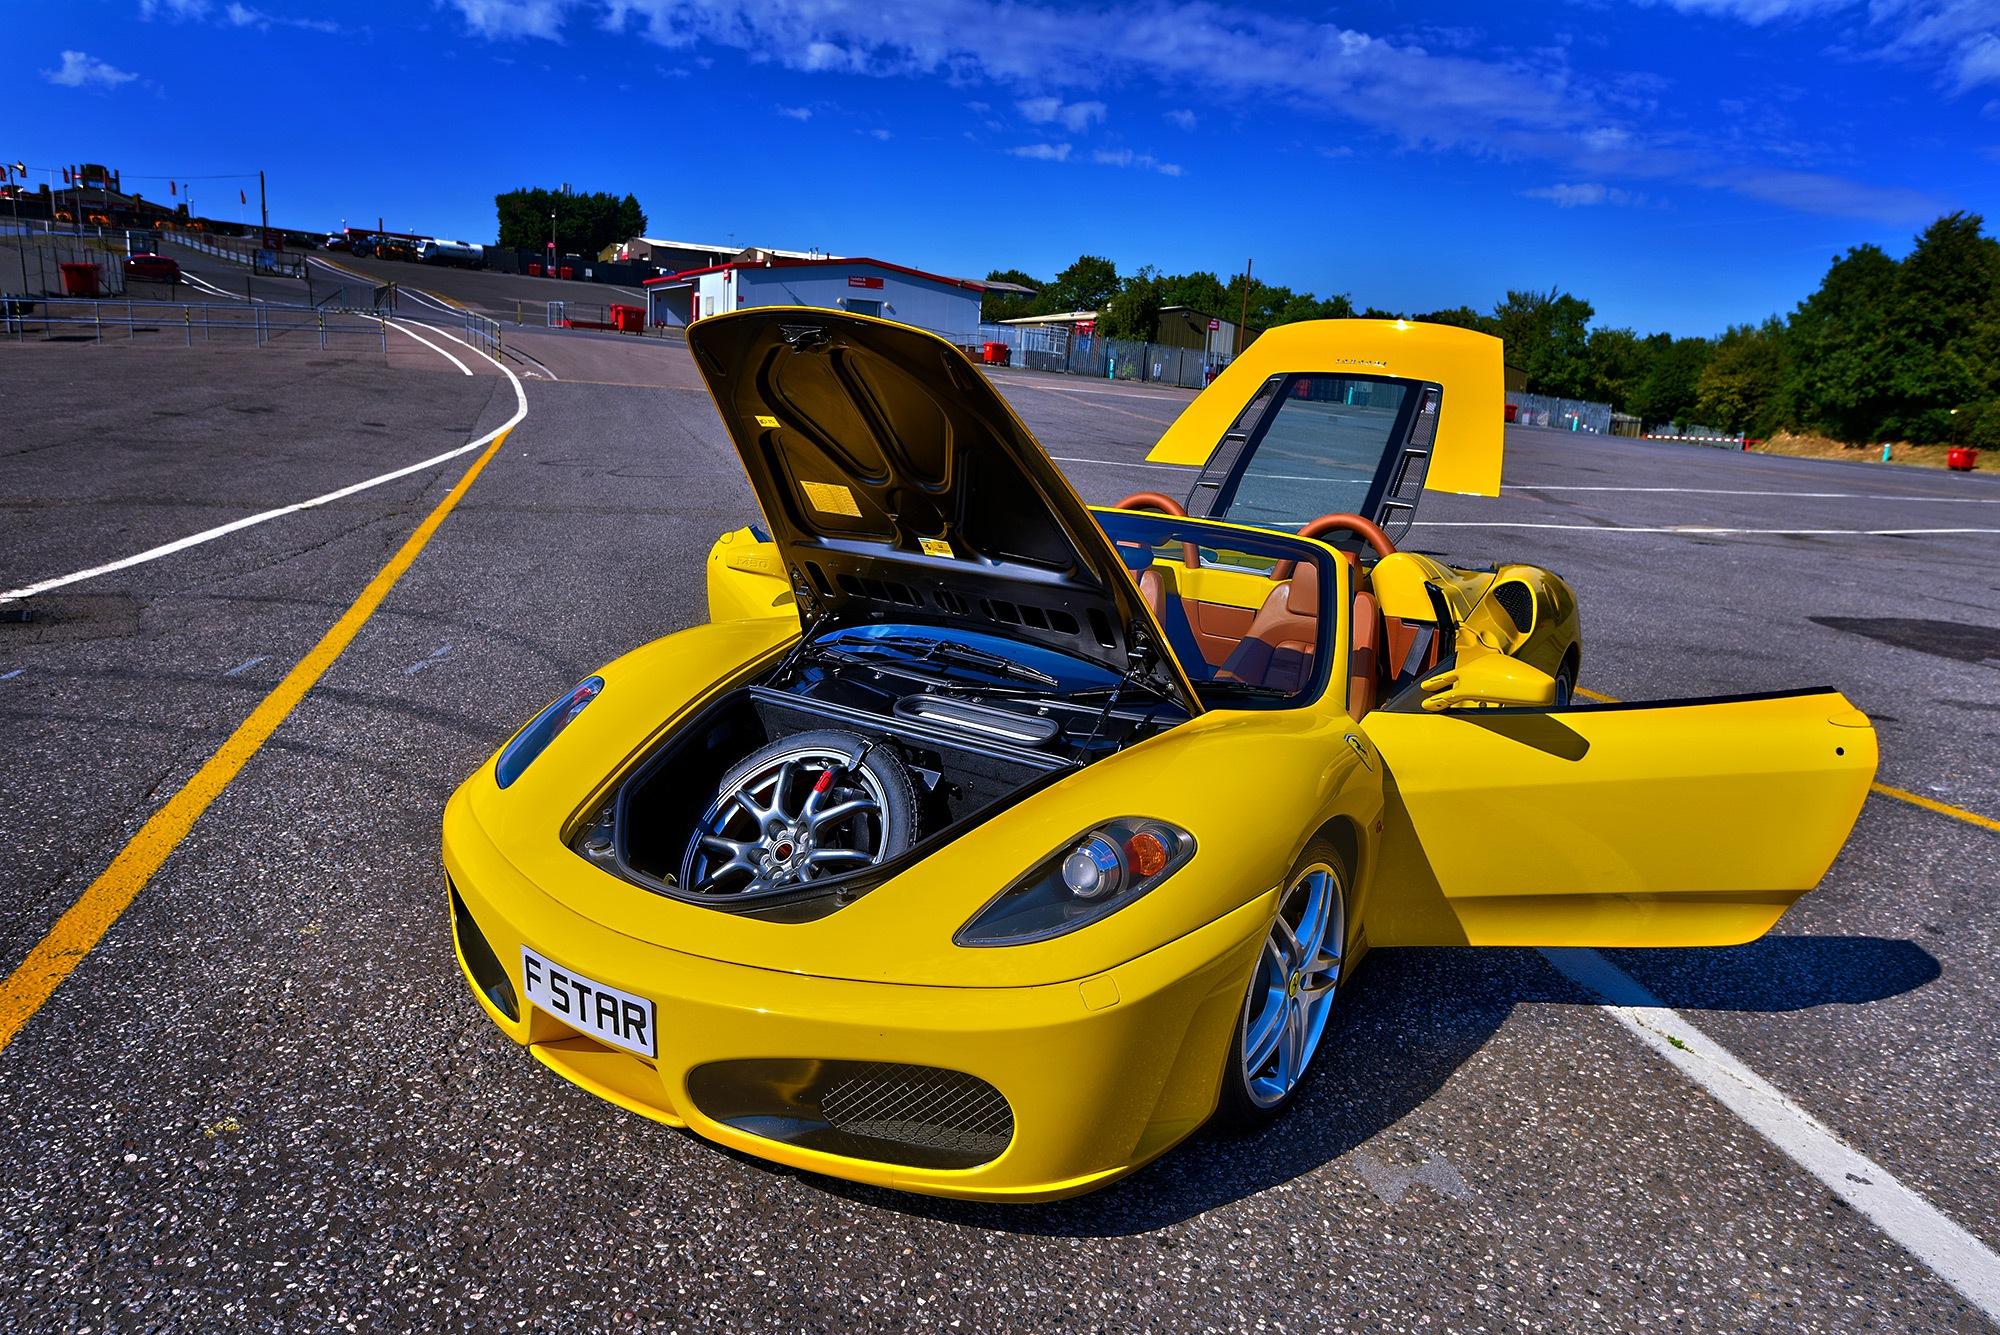 Ferrari F430 by David Marsh